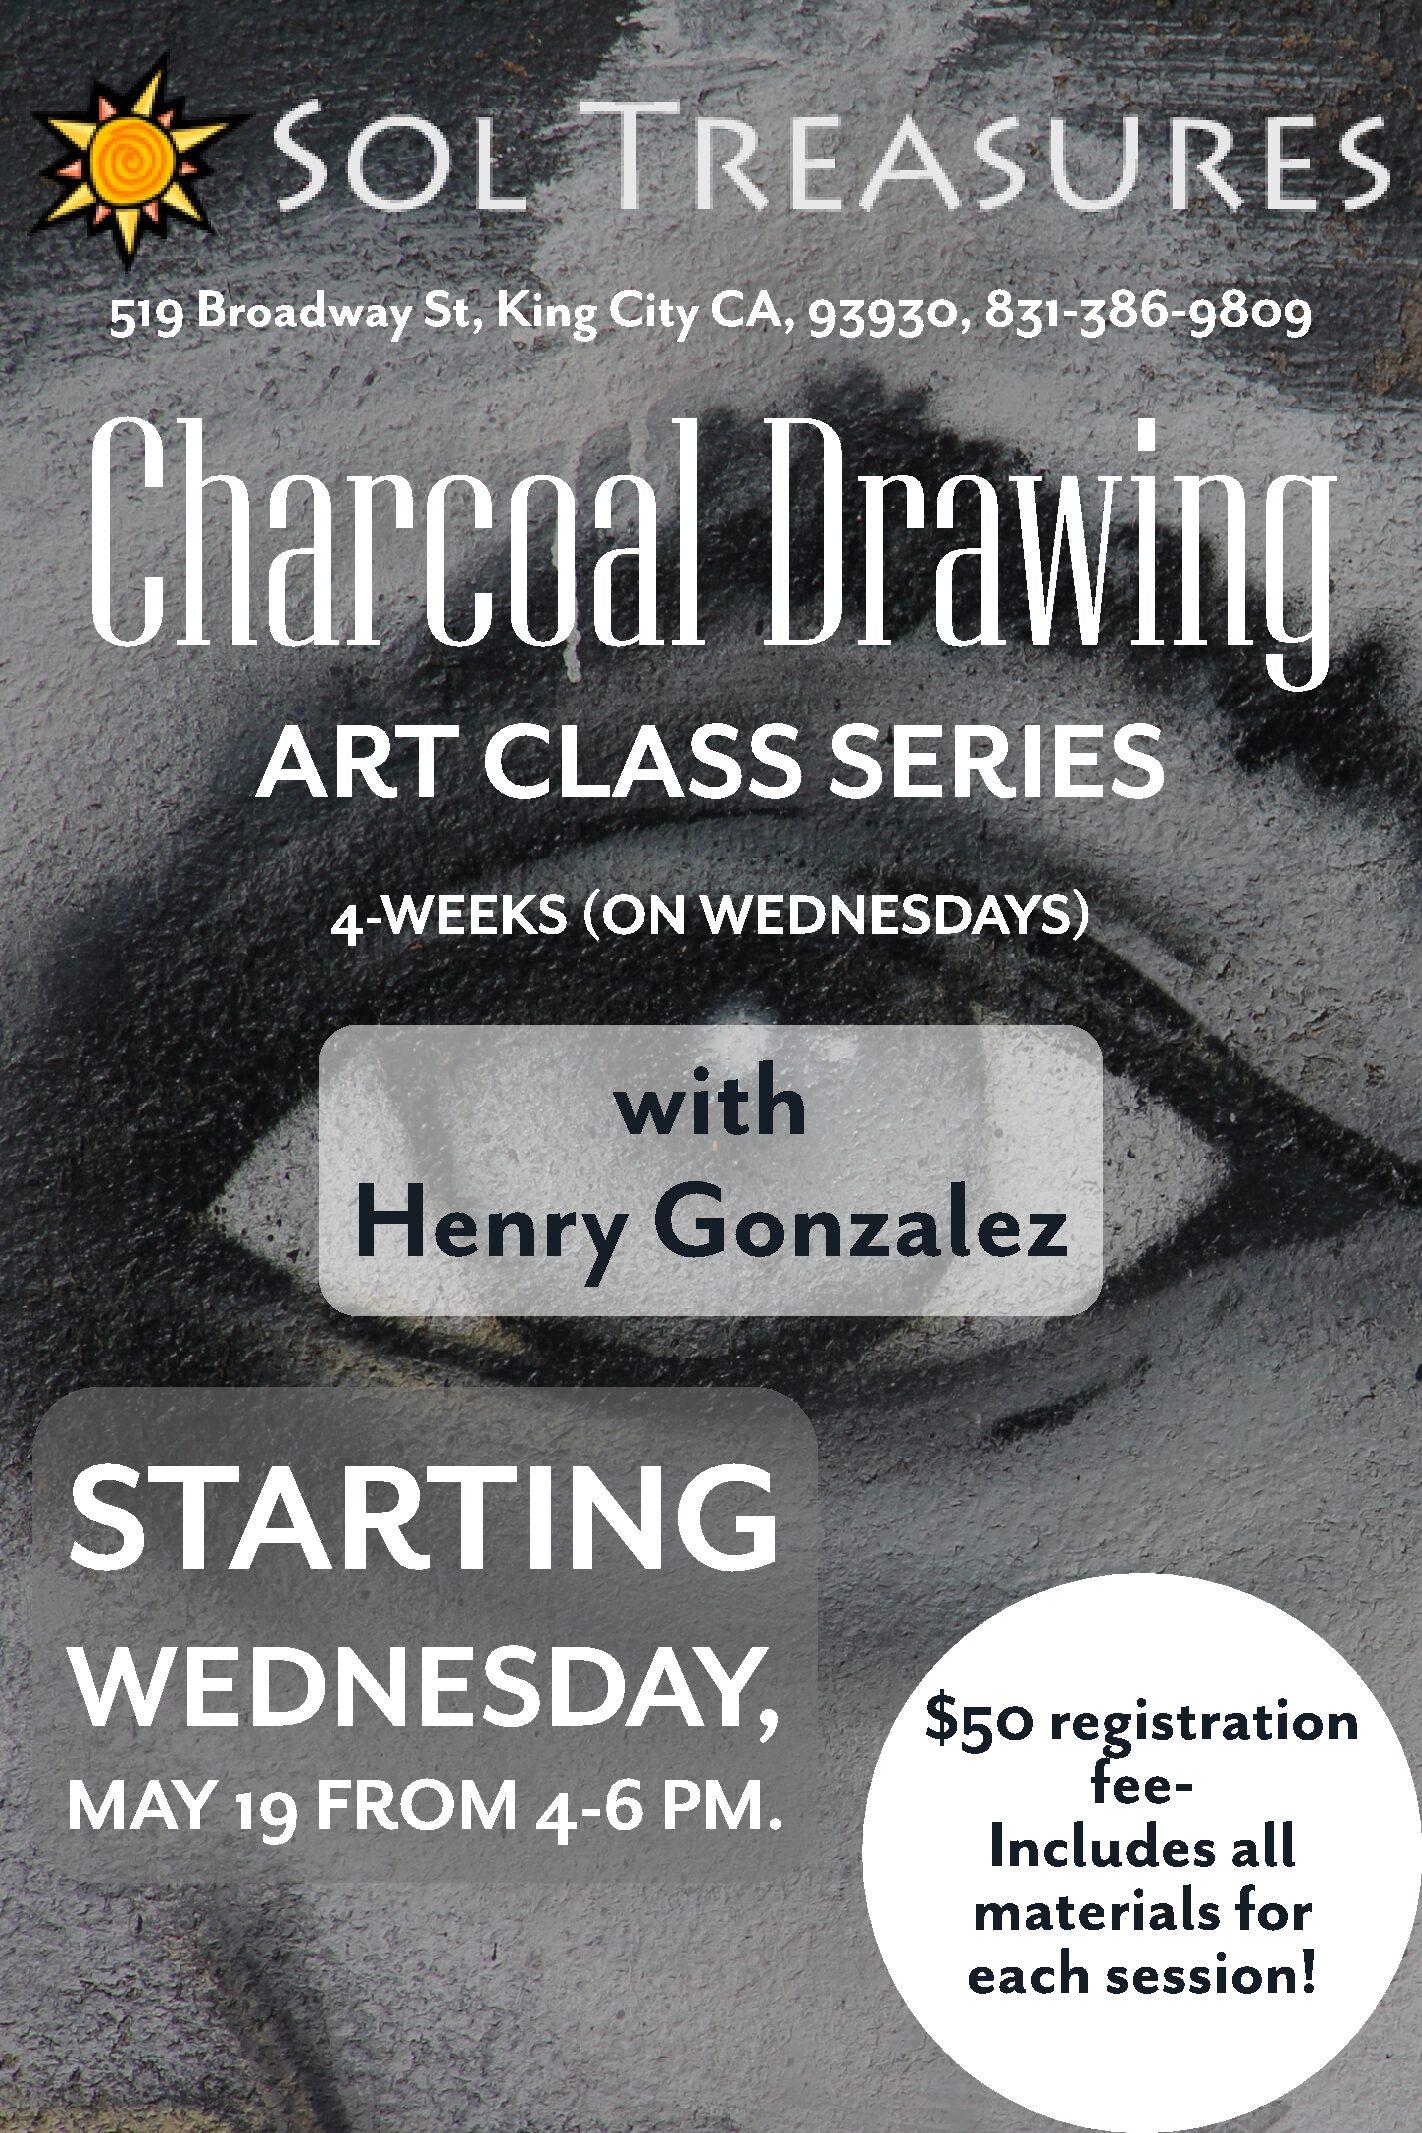 Charcoal Drawing Art Class Series